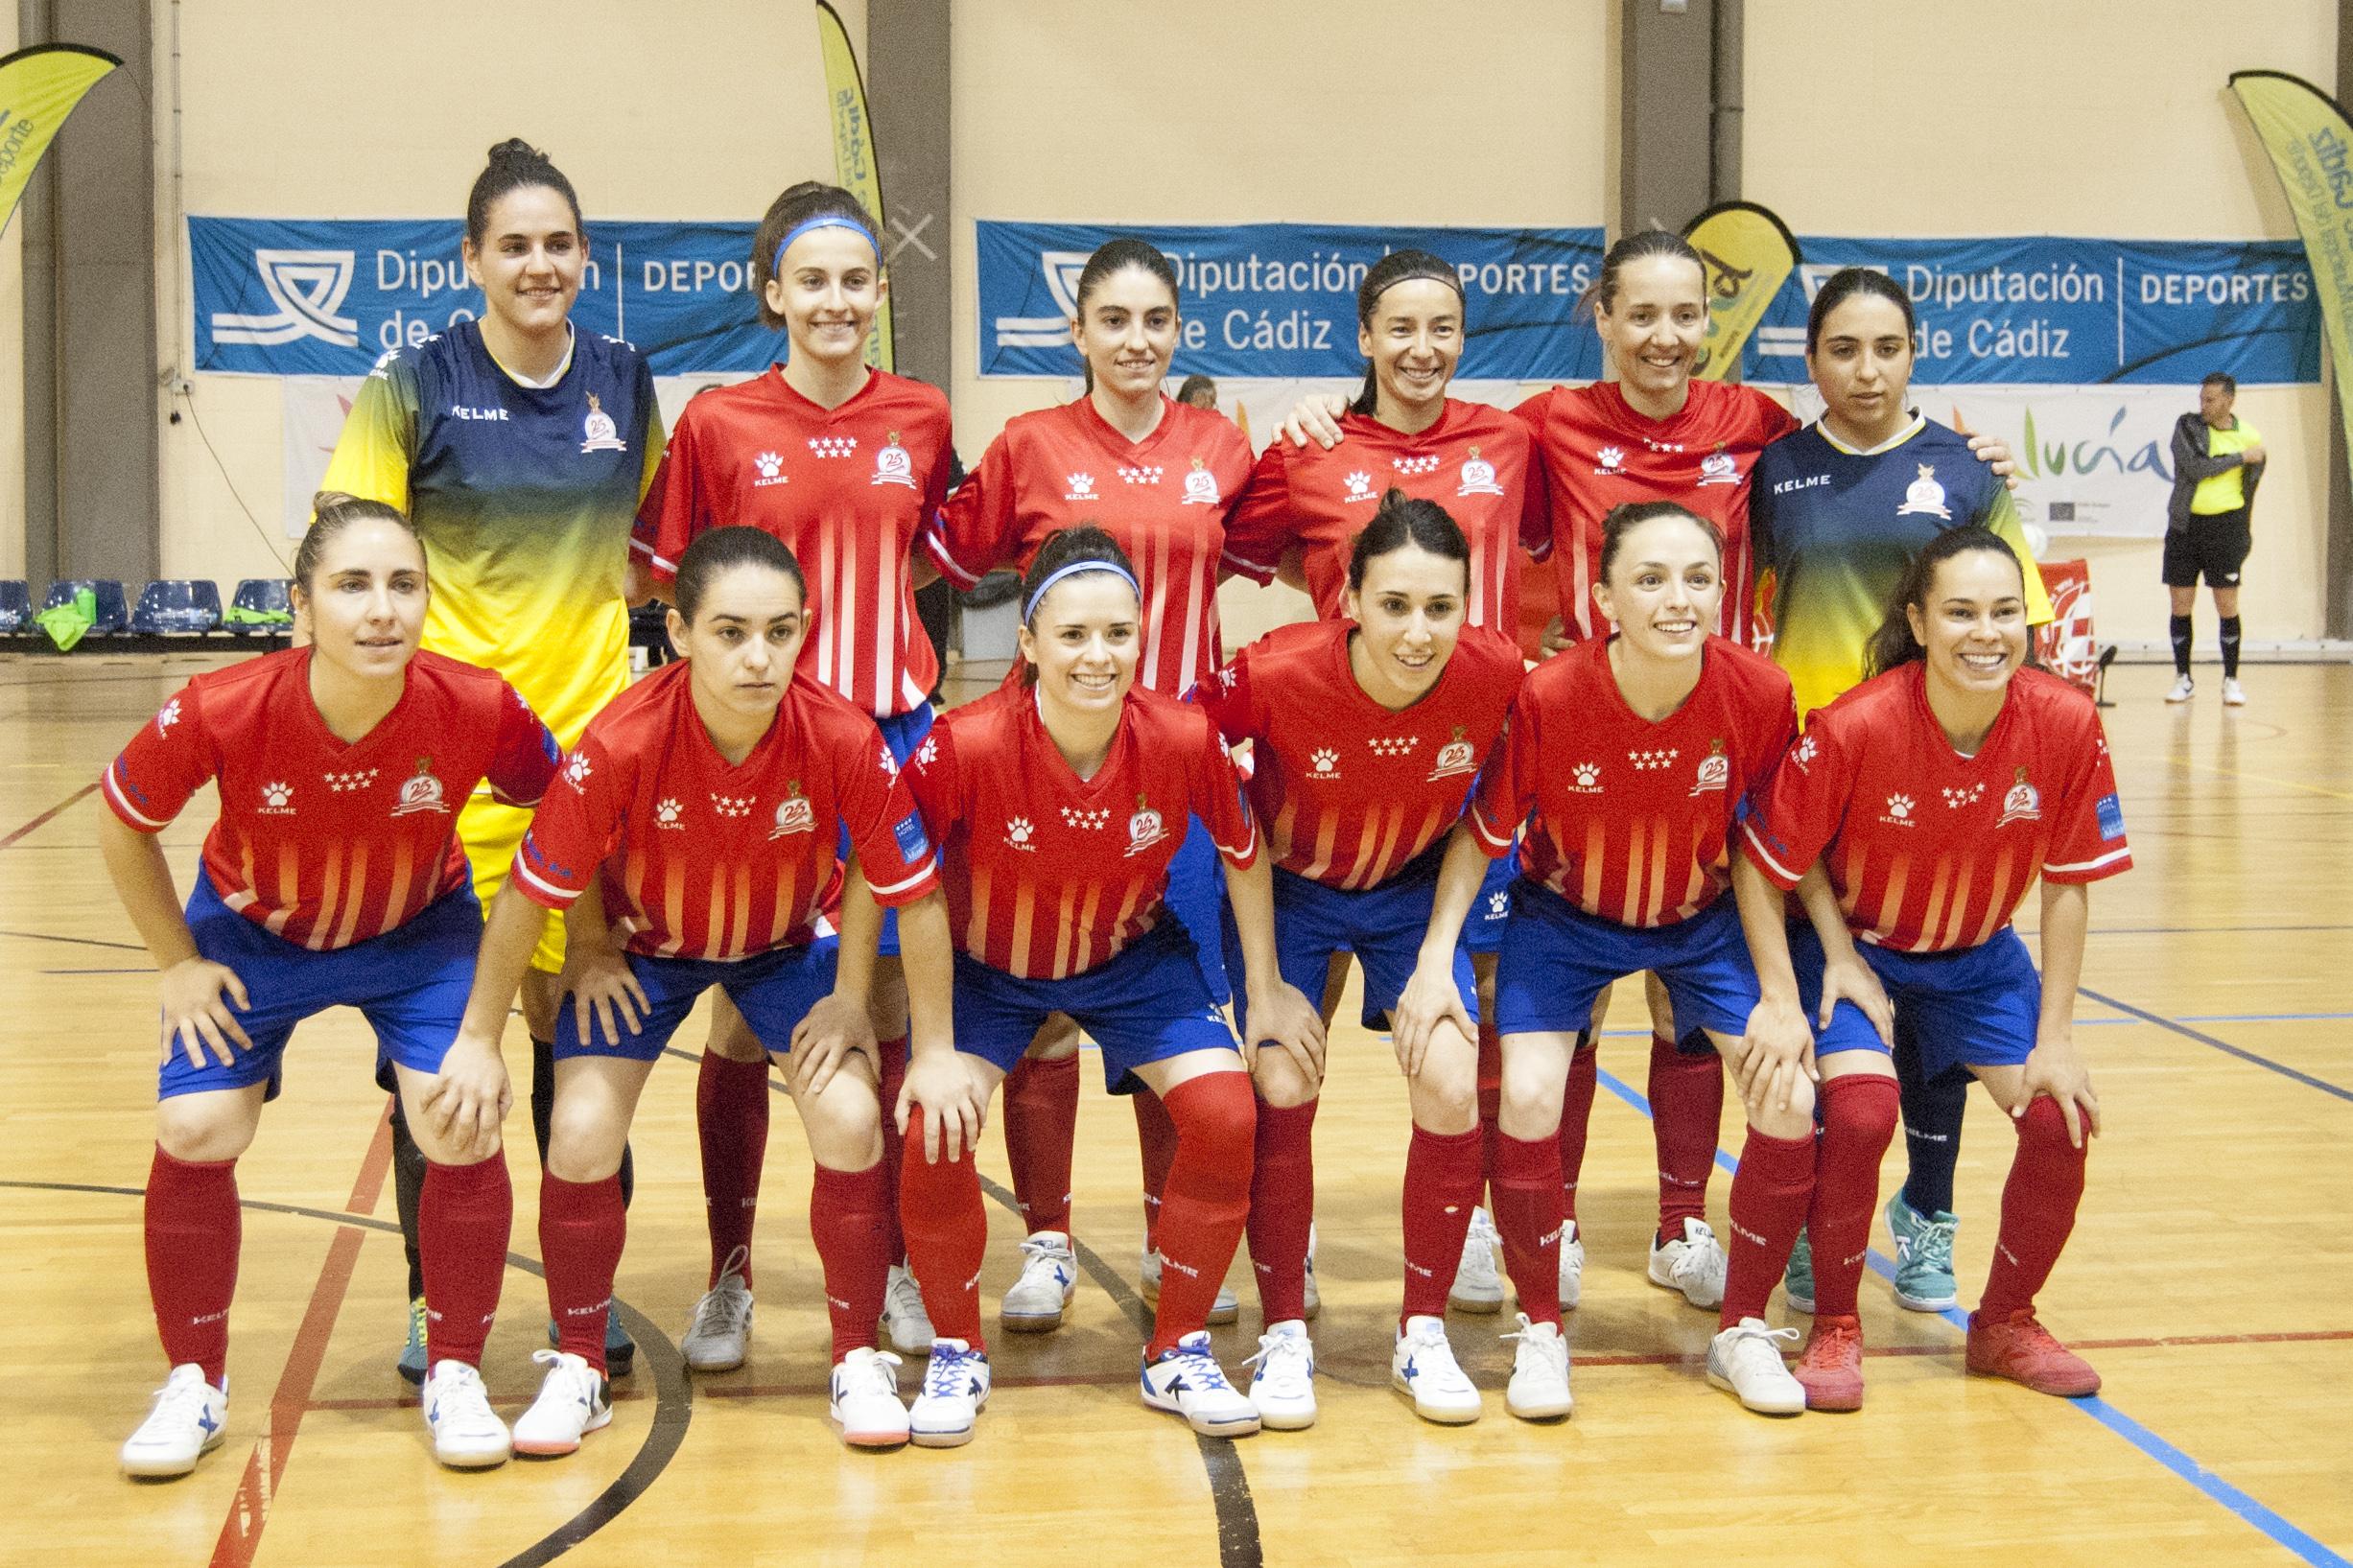 Atlético Navalcarnero - Wikipedia